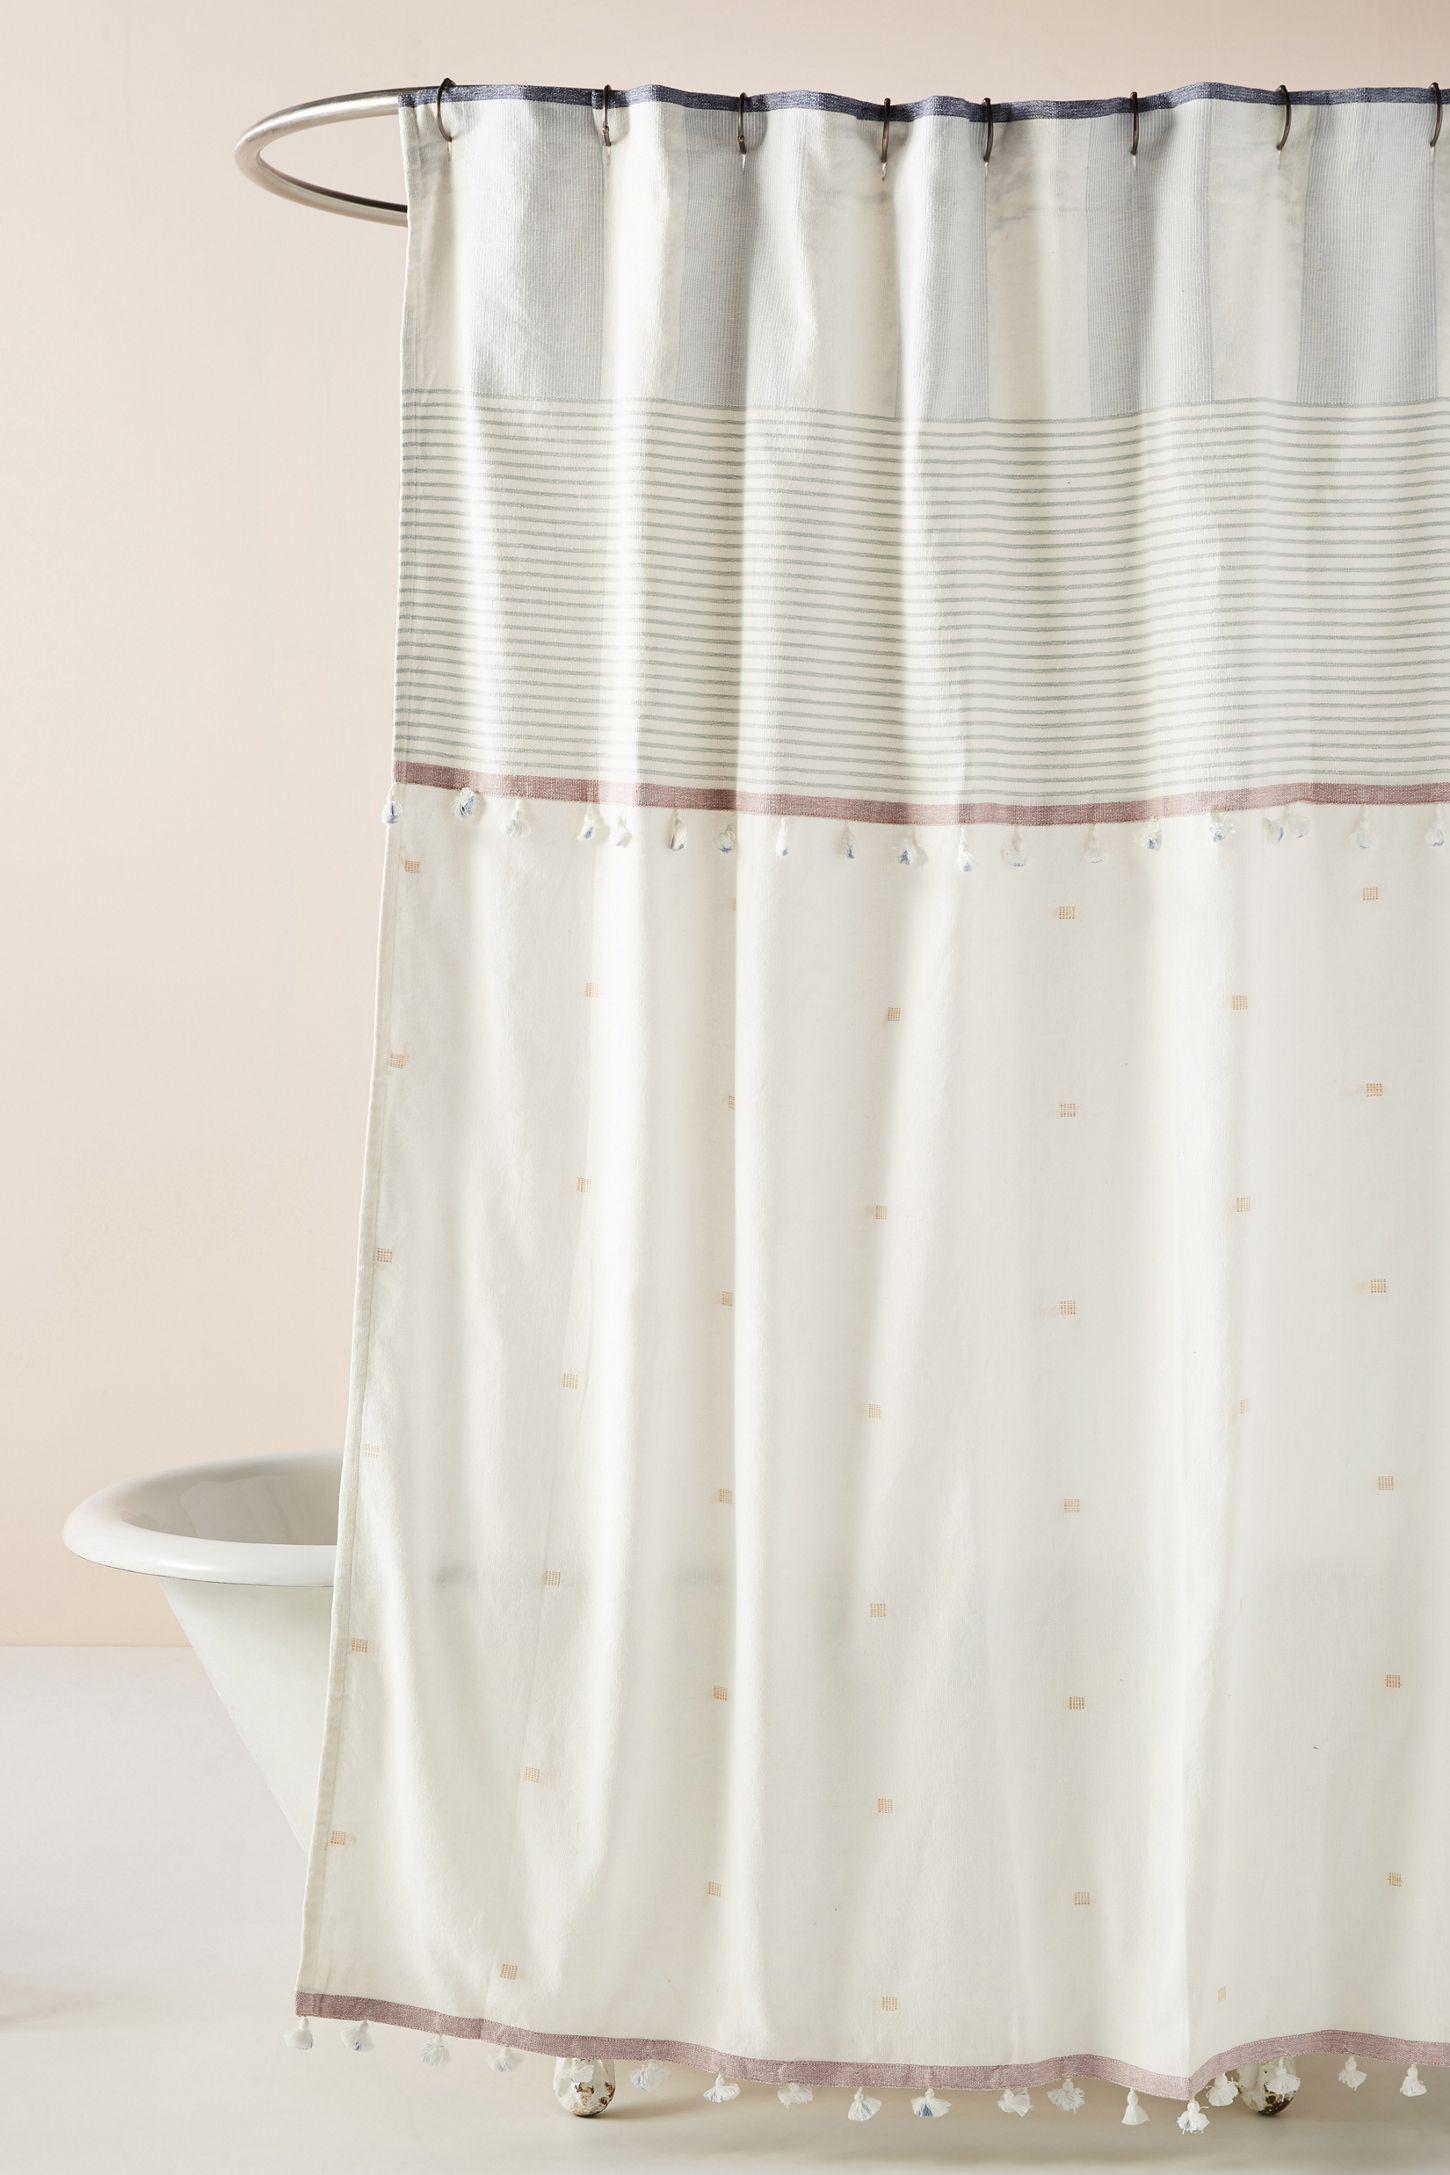 Tasseled Rayas Shower Curtain Curtains Shower Curtain Rustic